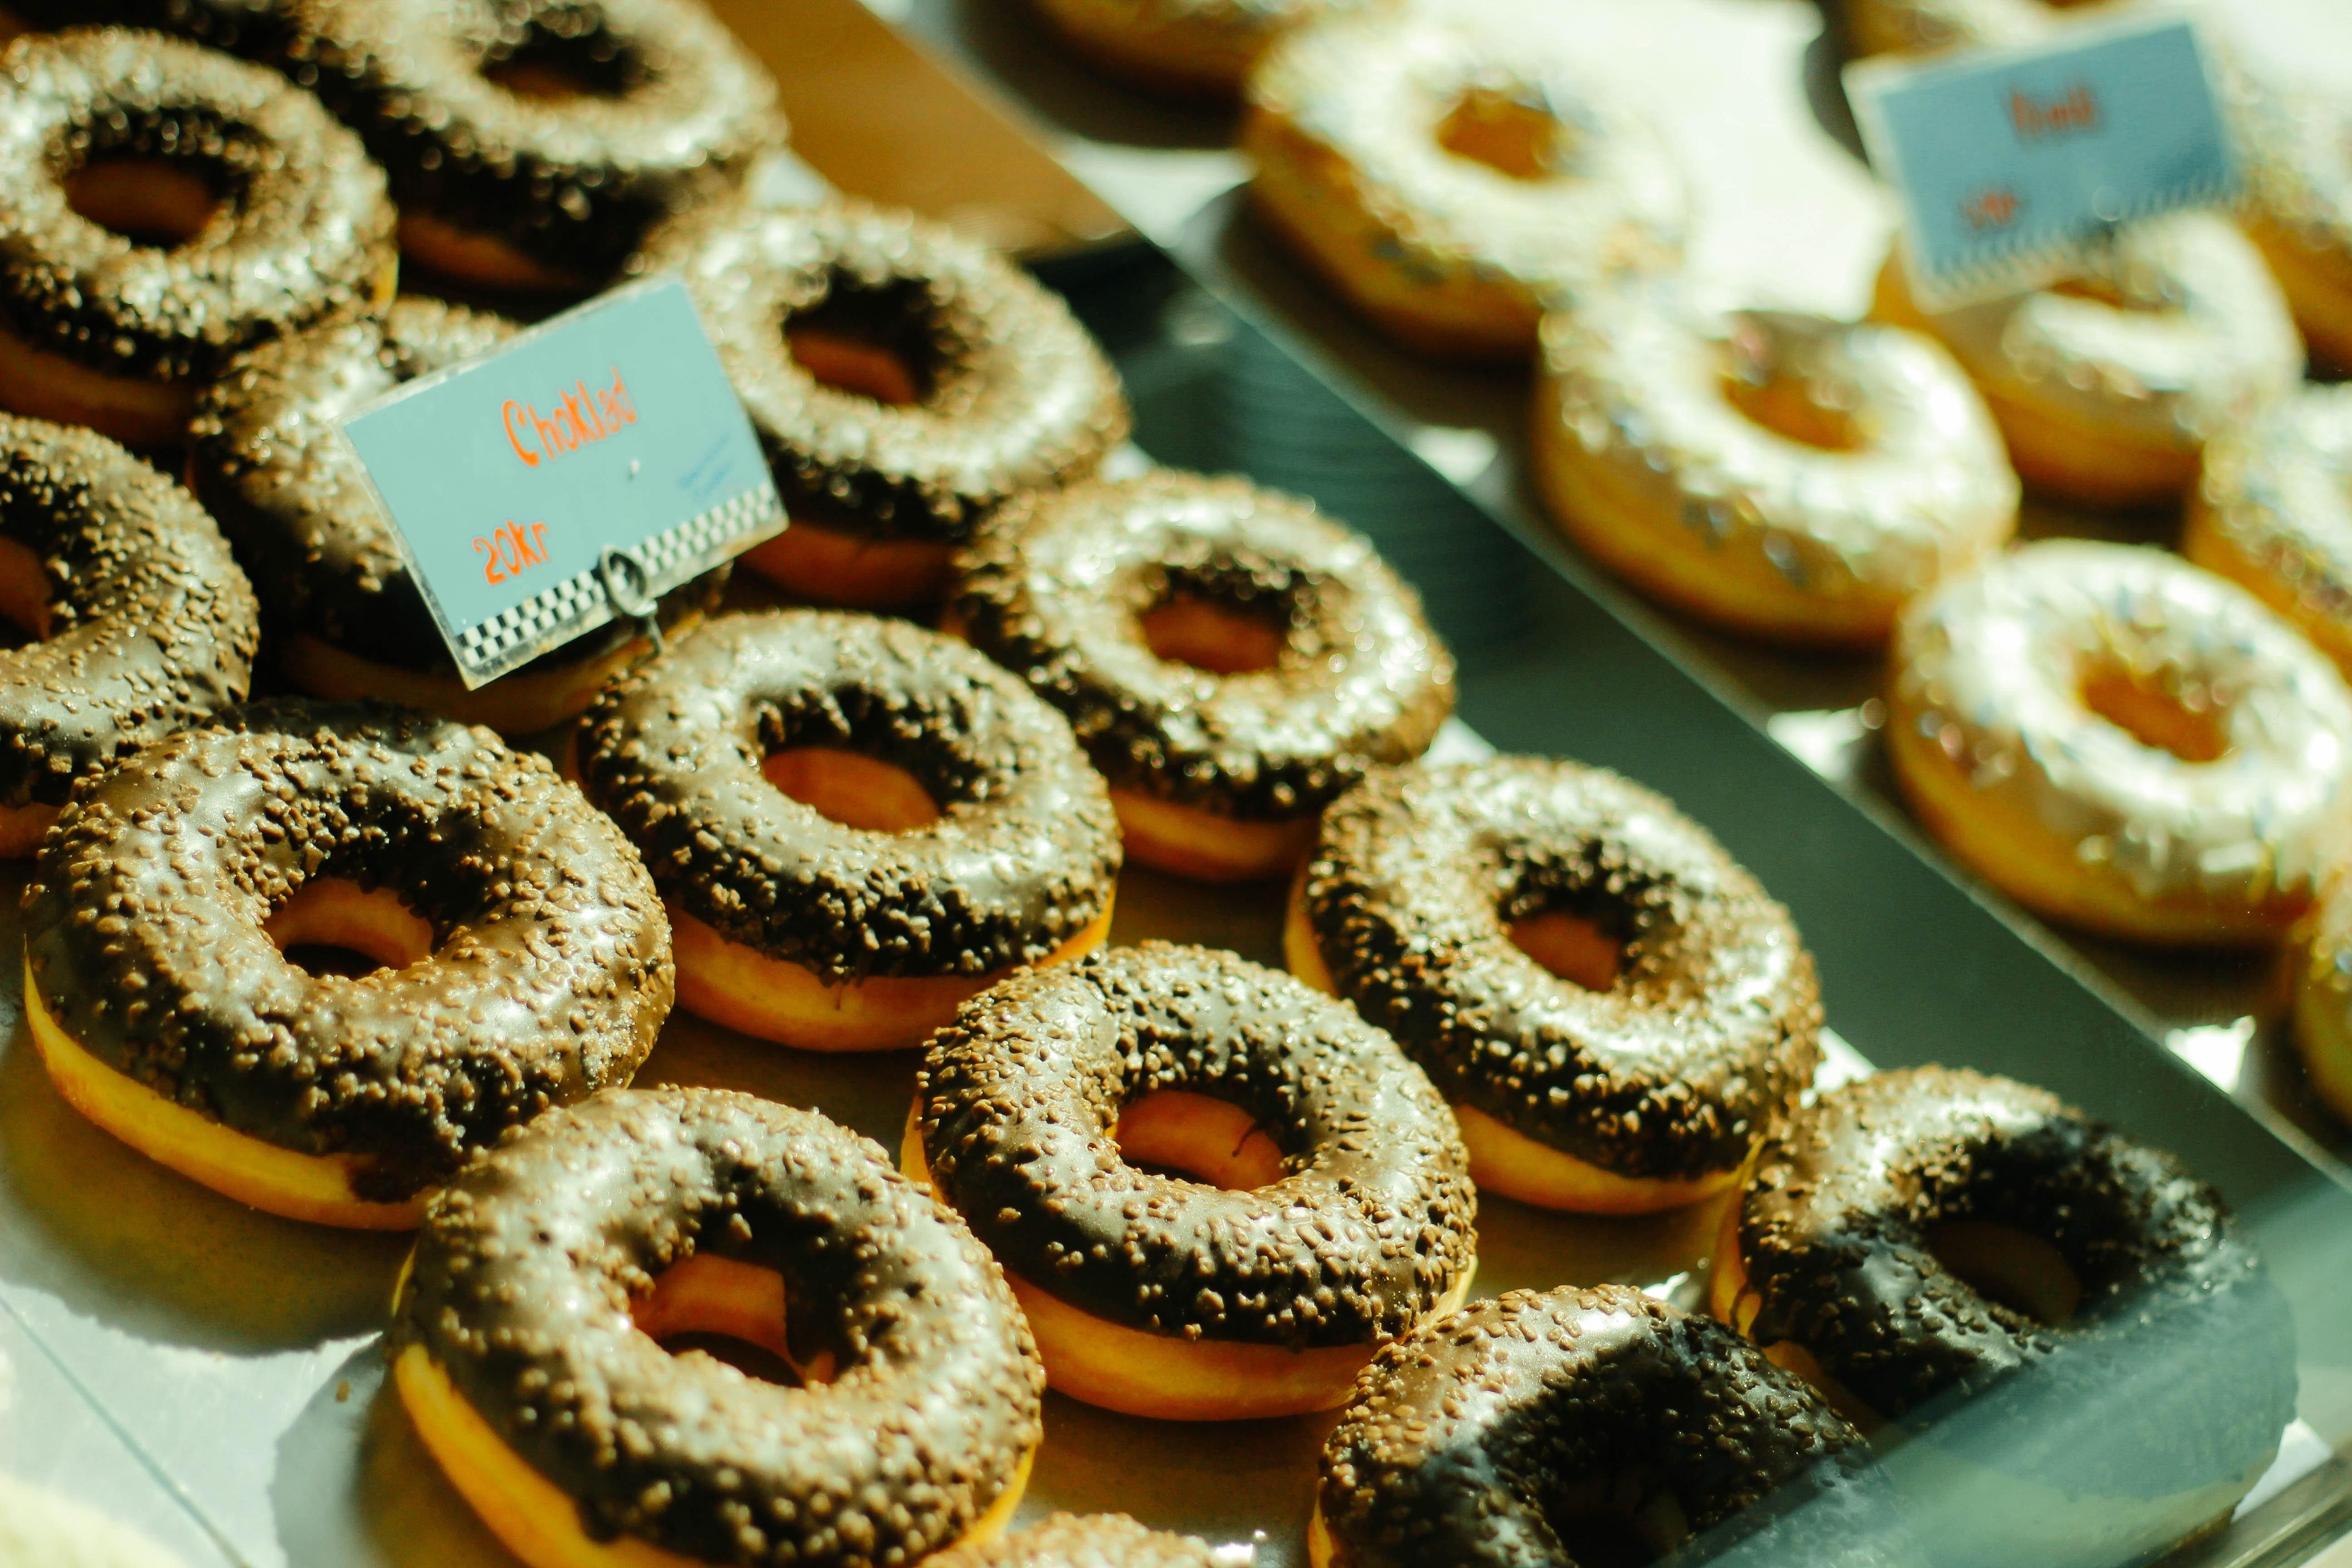 close-up-photo-of-chocolate-doughnuts-1591180